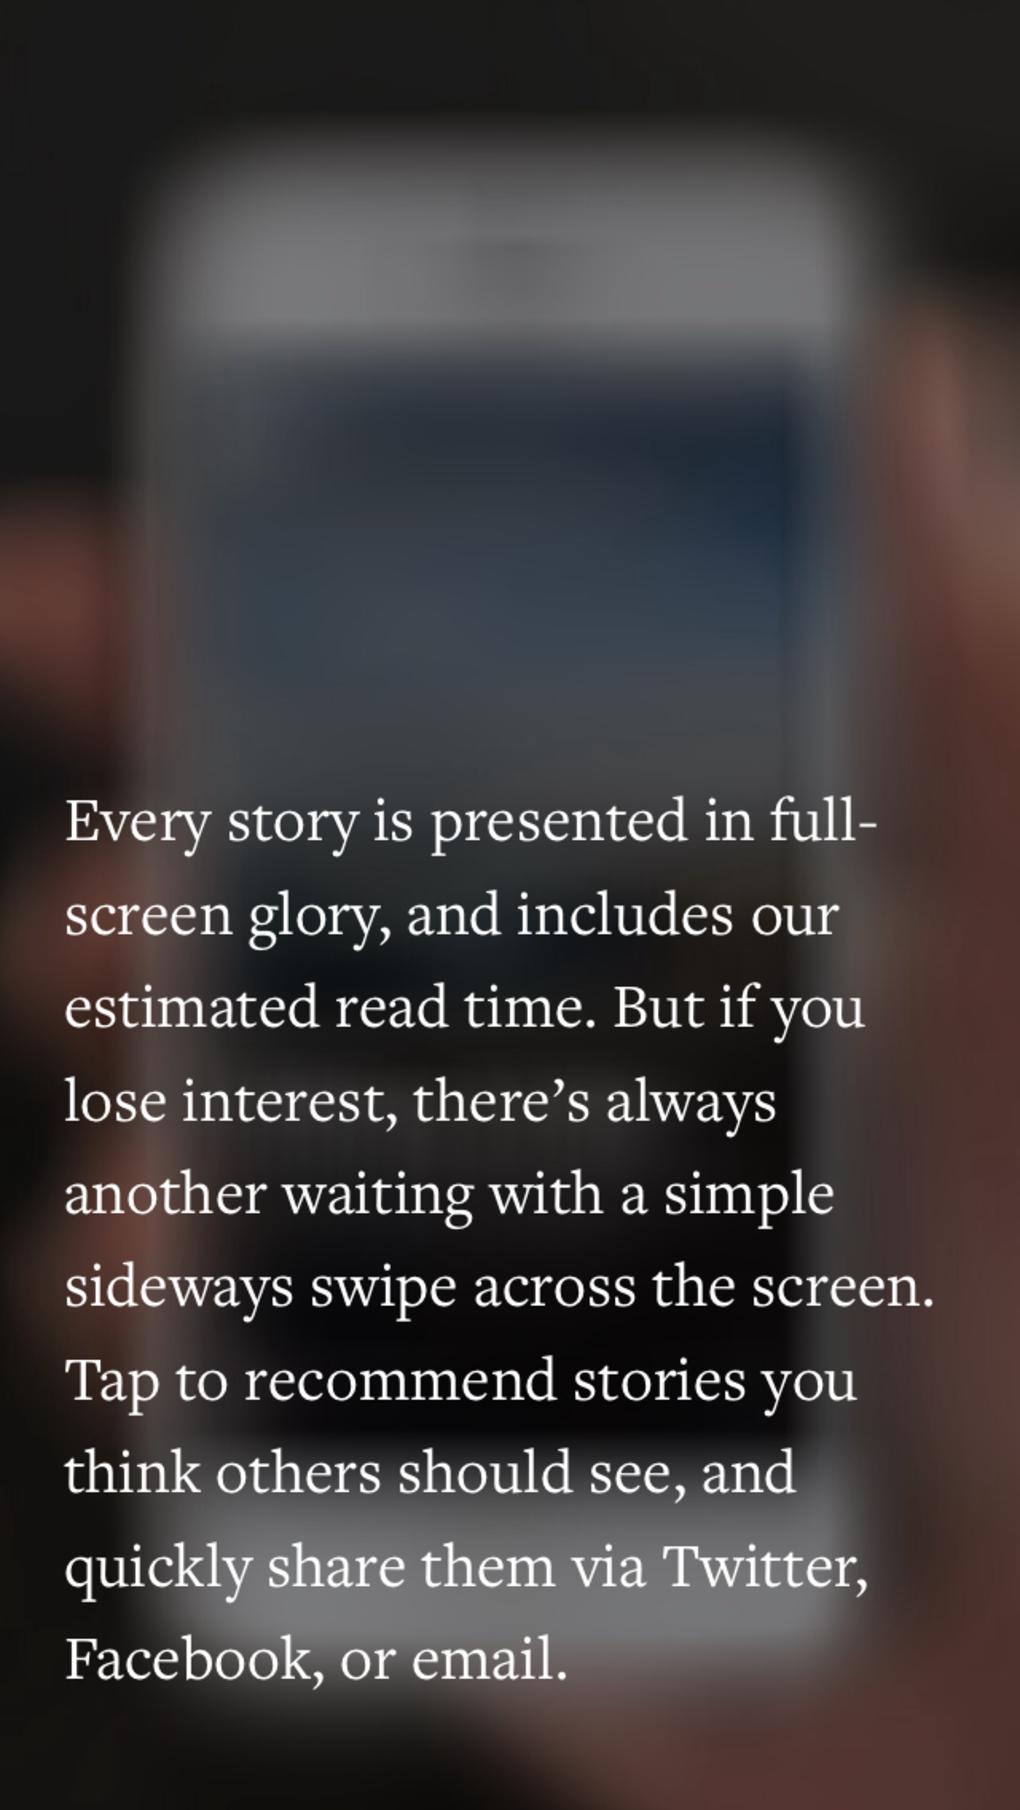 medium-app-apresentacao